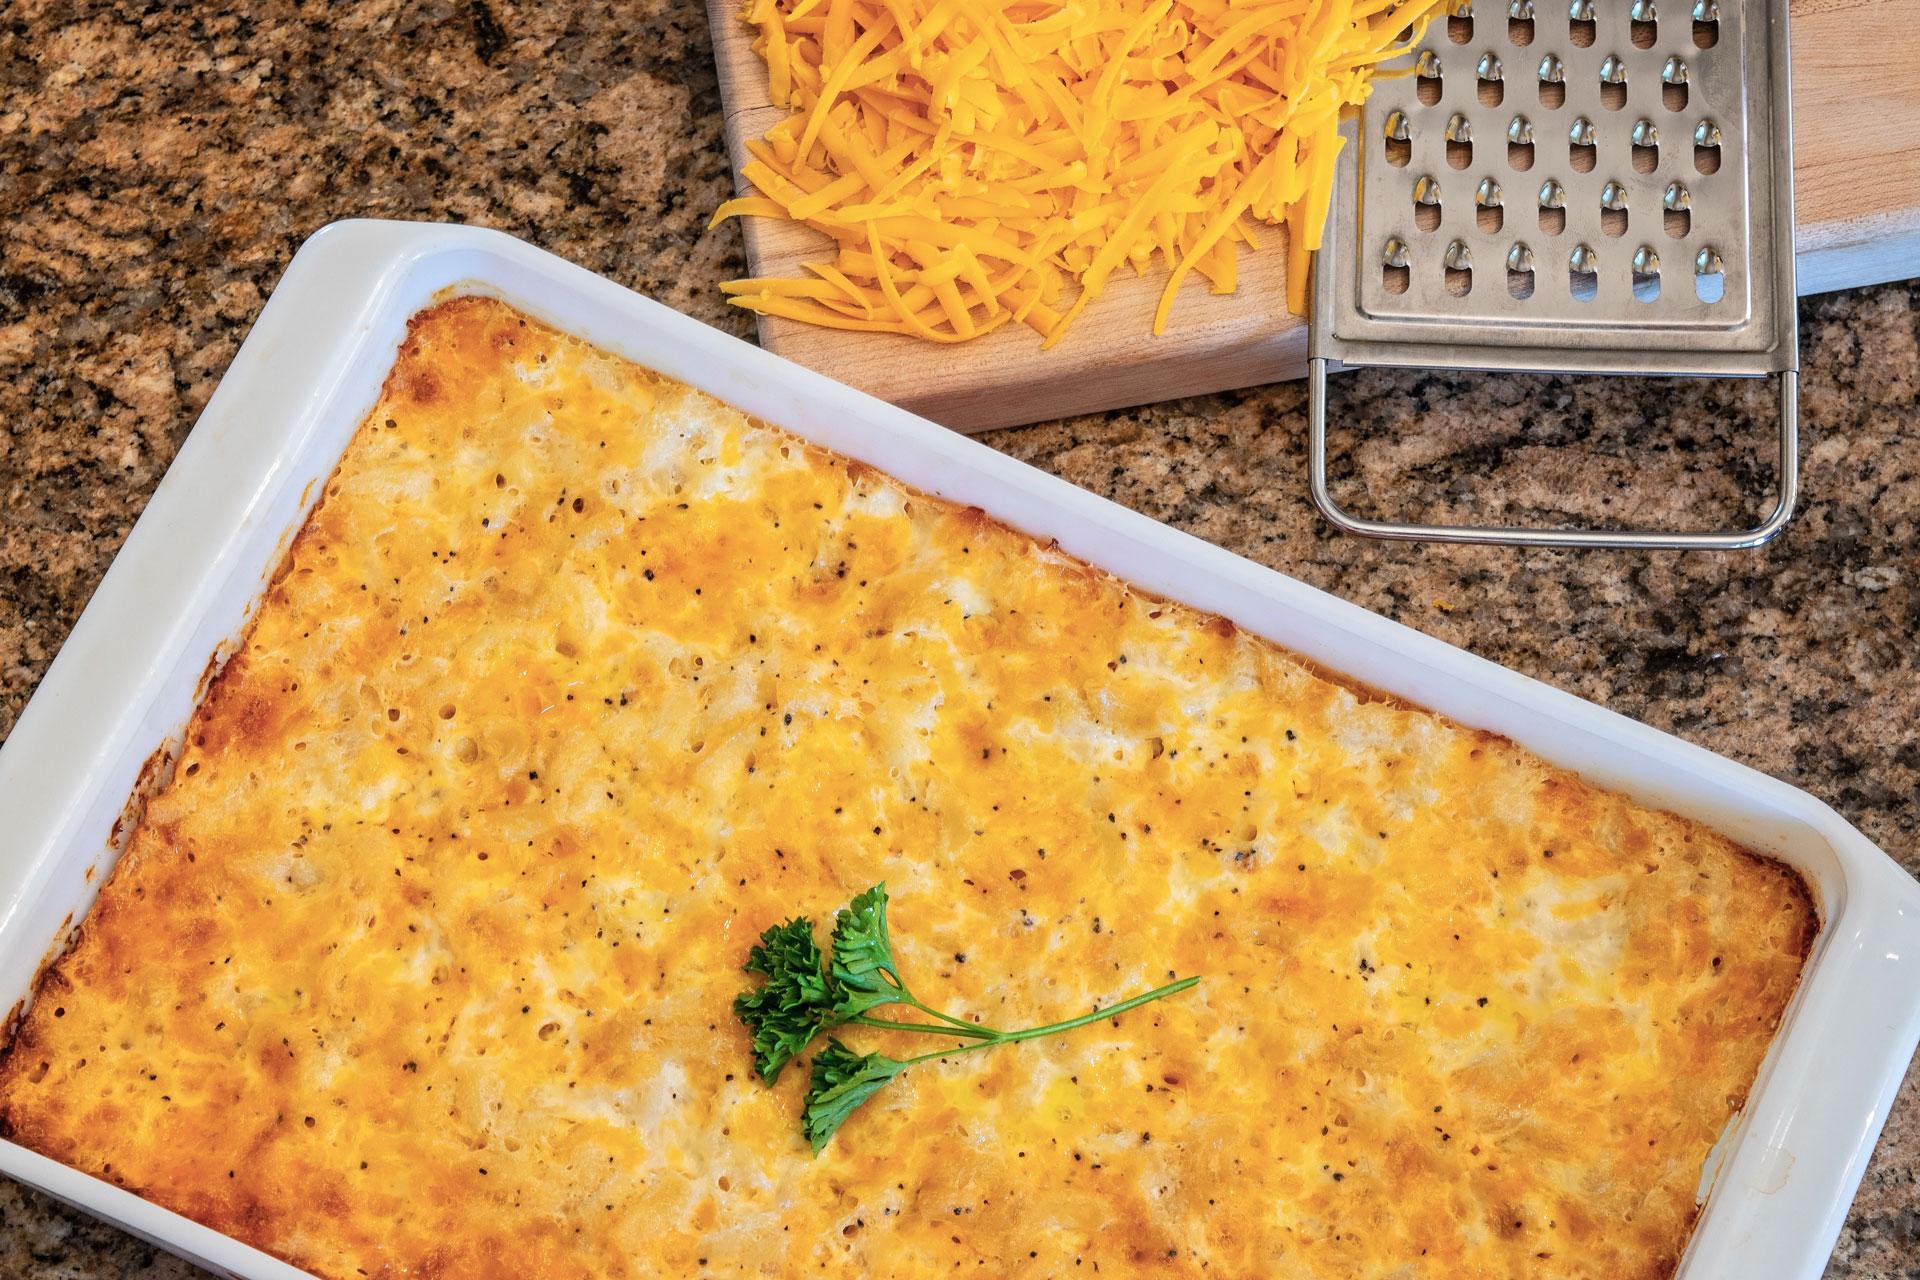 Easy Baked Macaroni & Cheese